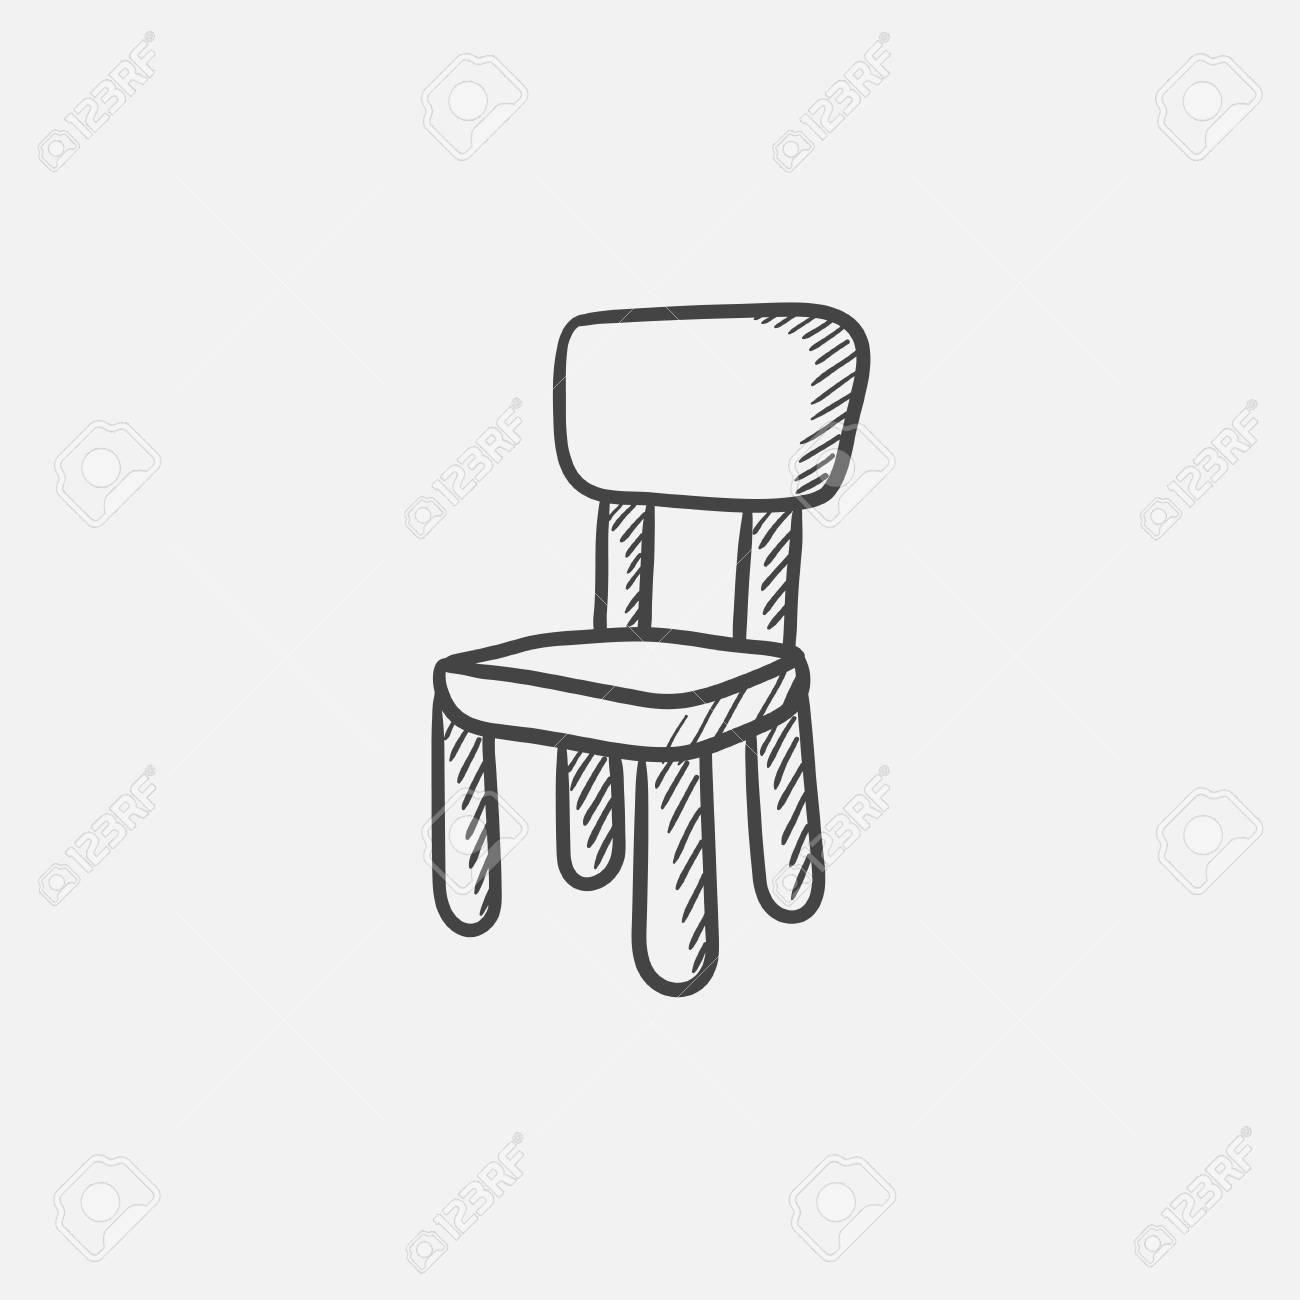 Stuhl Fur Kinder Skizze Icon Web Handy Und Infografik Hand